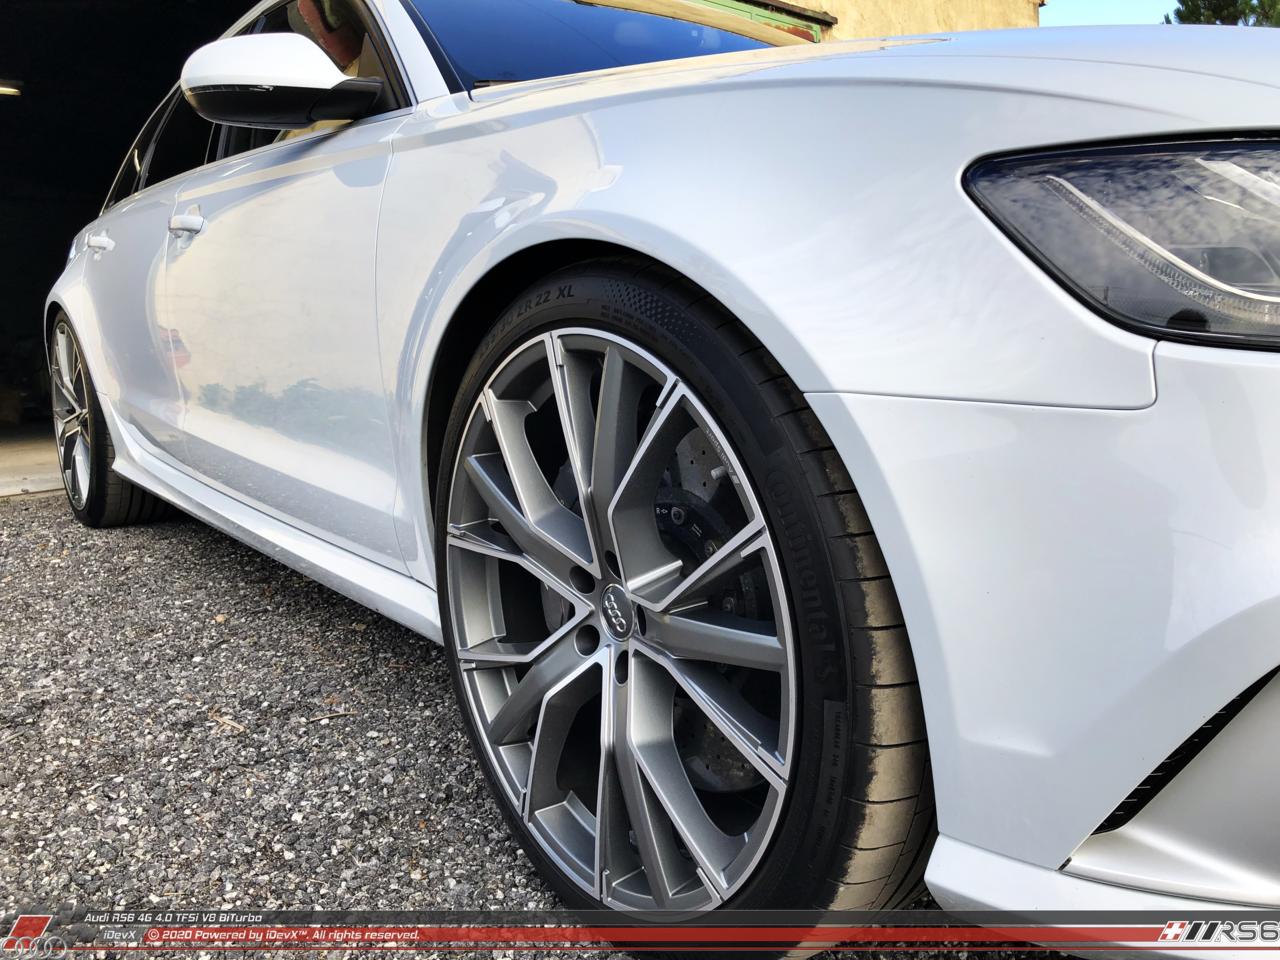 05_08.2019_Audi-RS6_iDevX_052.png